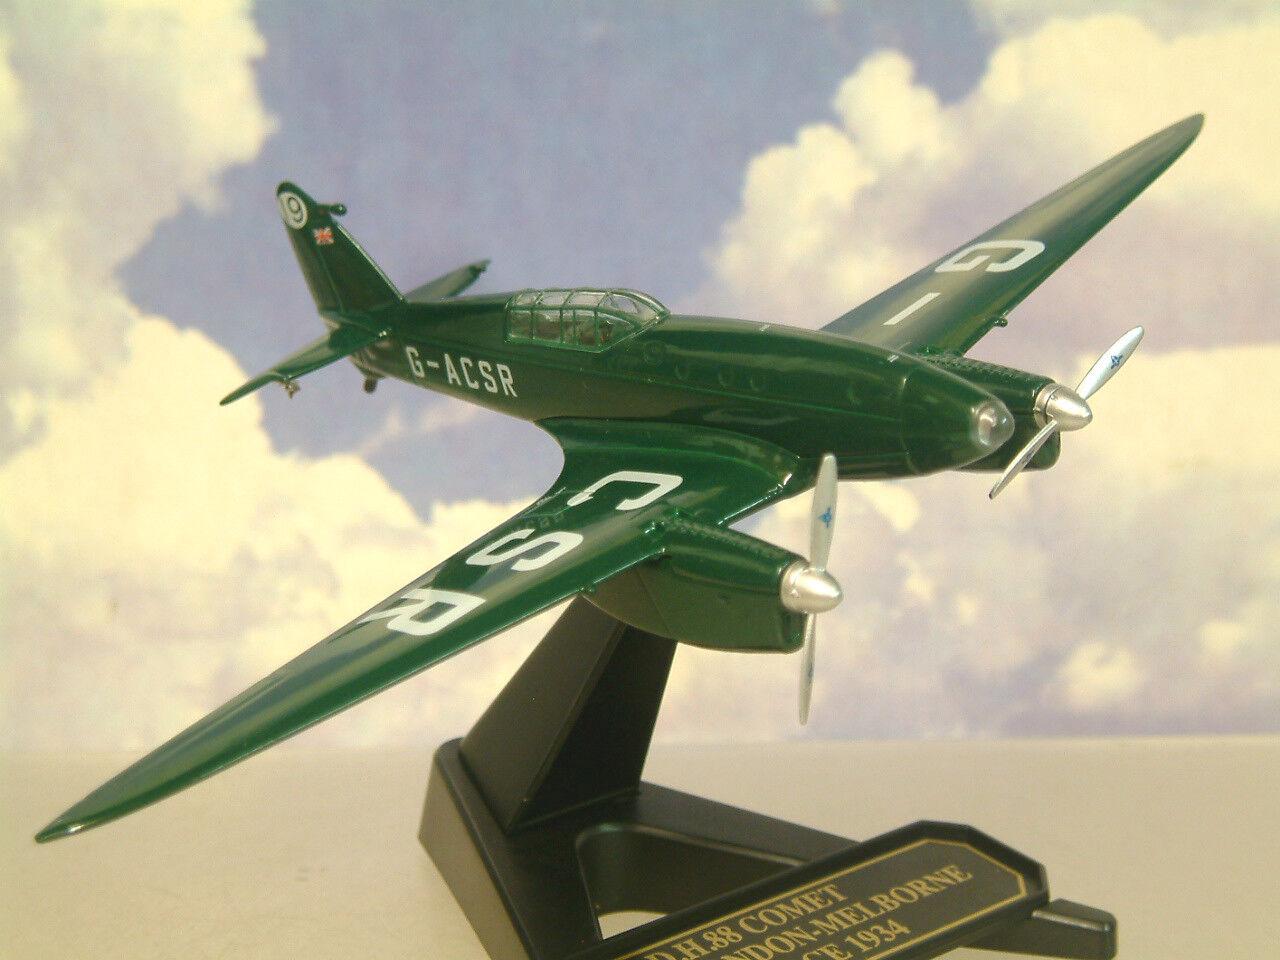 Oxford 1 72 Dehavilland Dh88 Comet G-Acsr 1934 Air Course No.19 en Vert 72com003